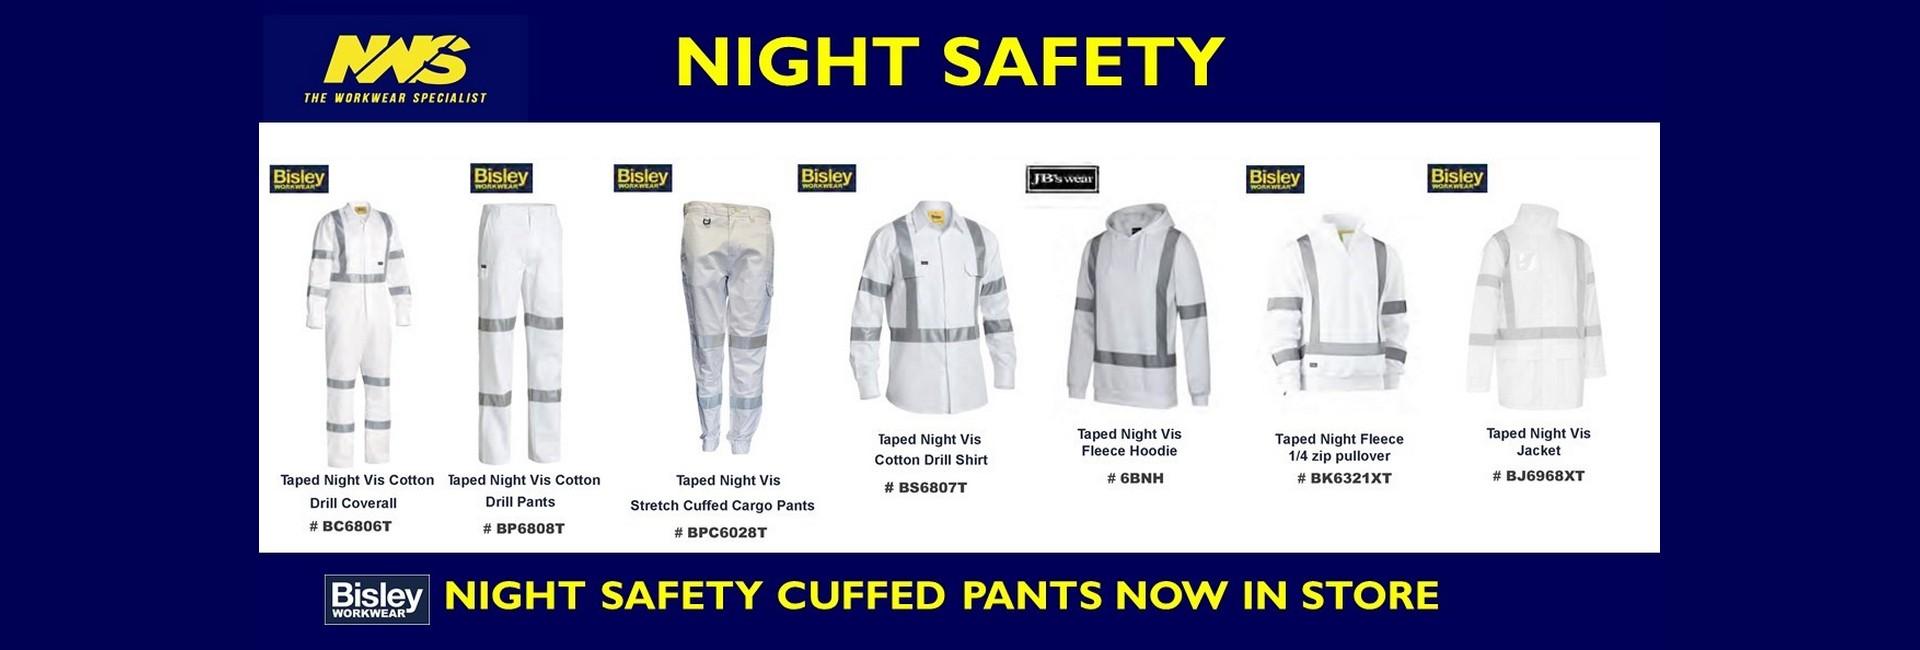 Bisley cuff night safety